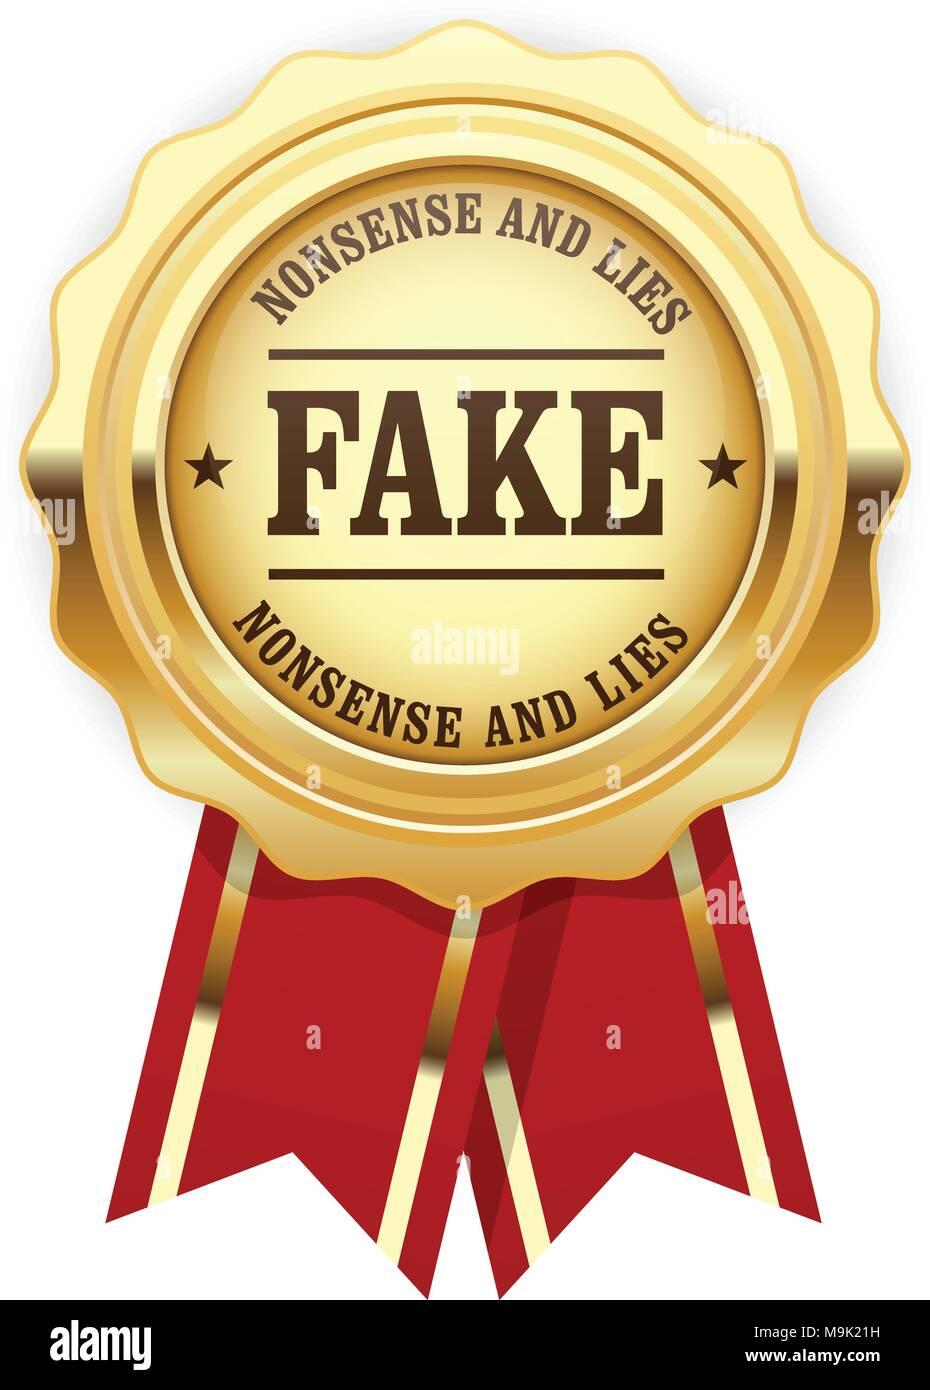 Fake rosette - golden seal with inscription Fake, falsification concept - Stock Image